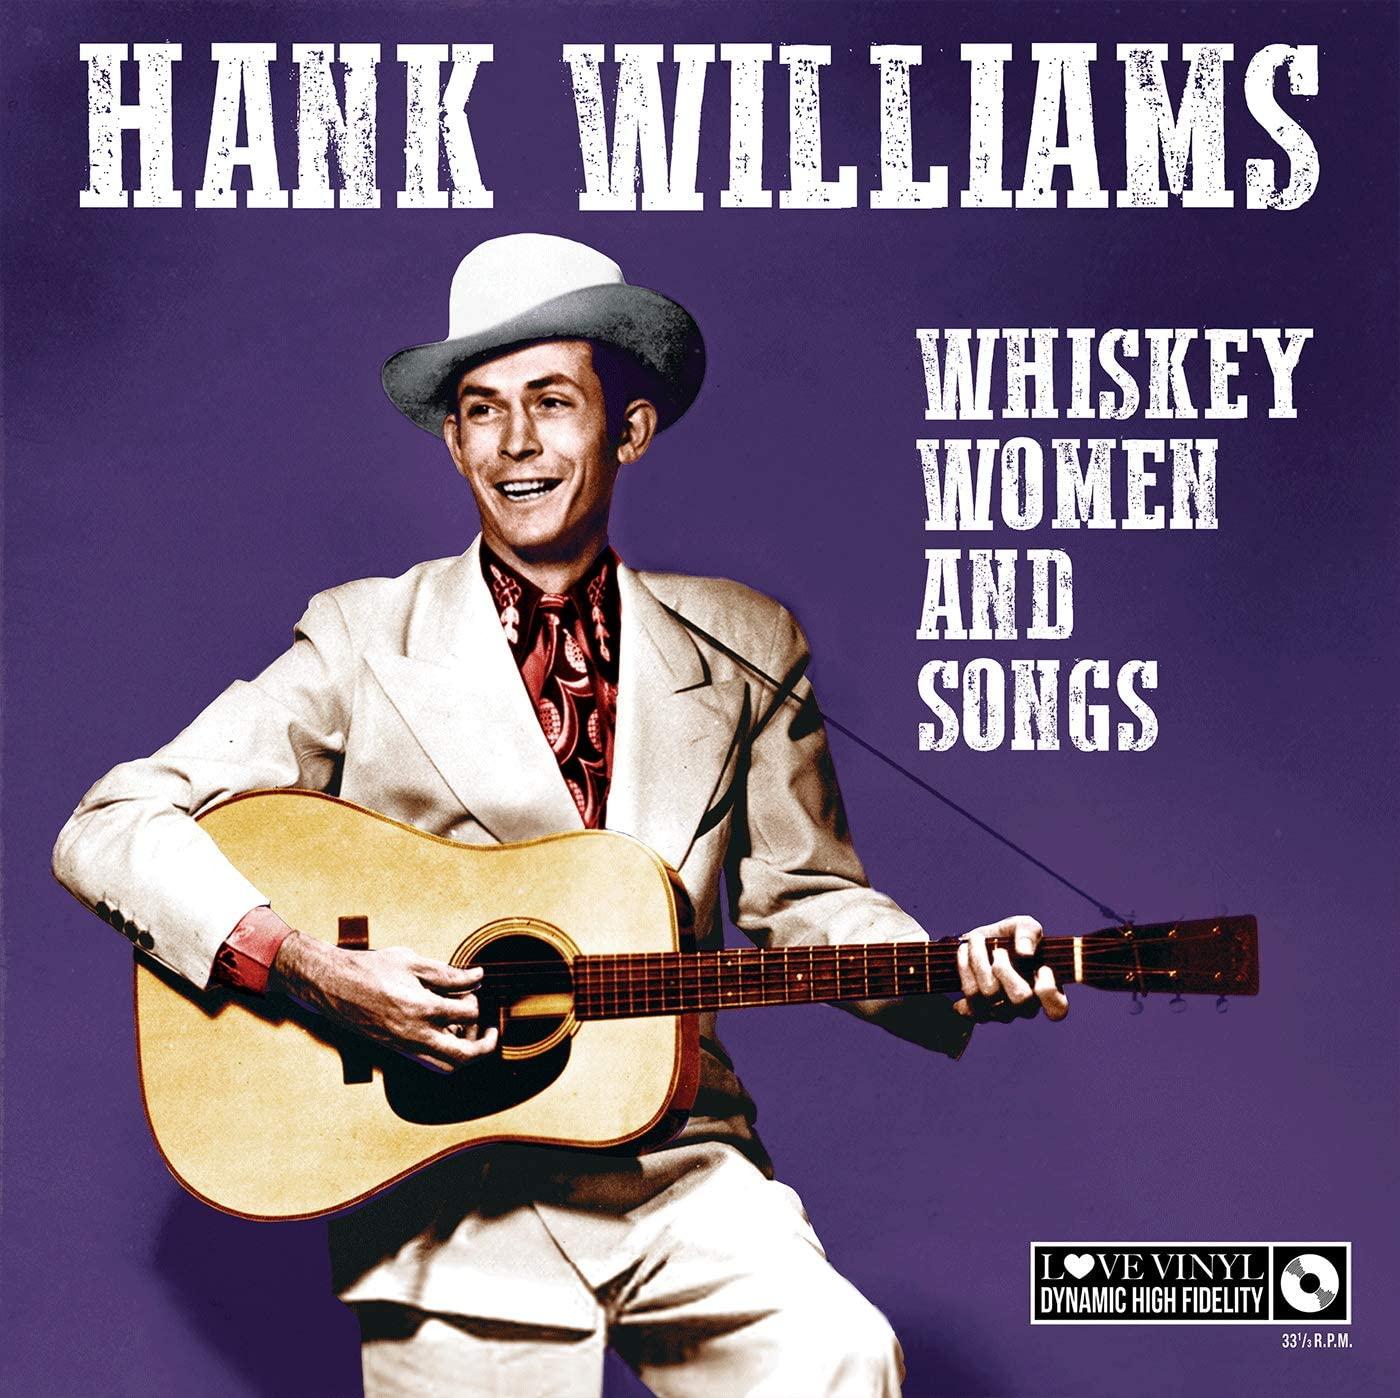 Whiskey, Women and Songs - Vinyl